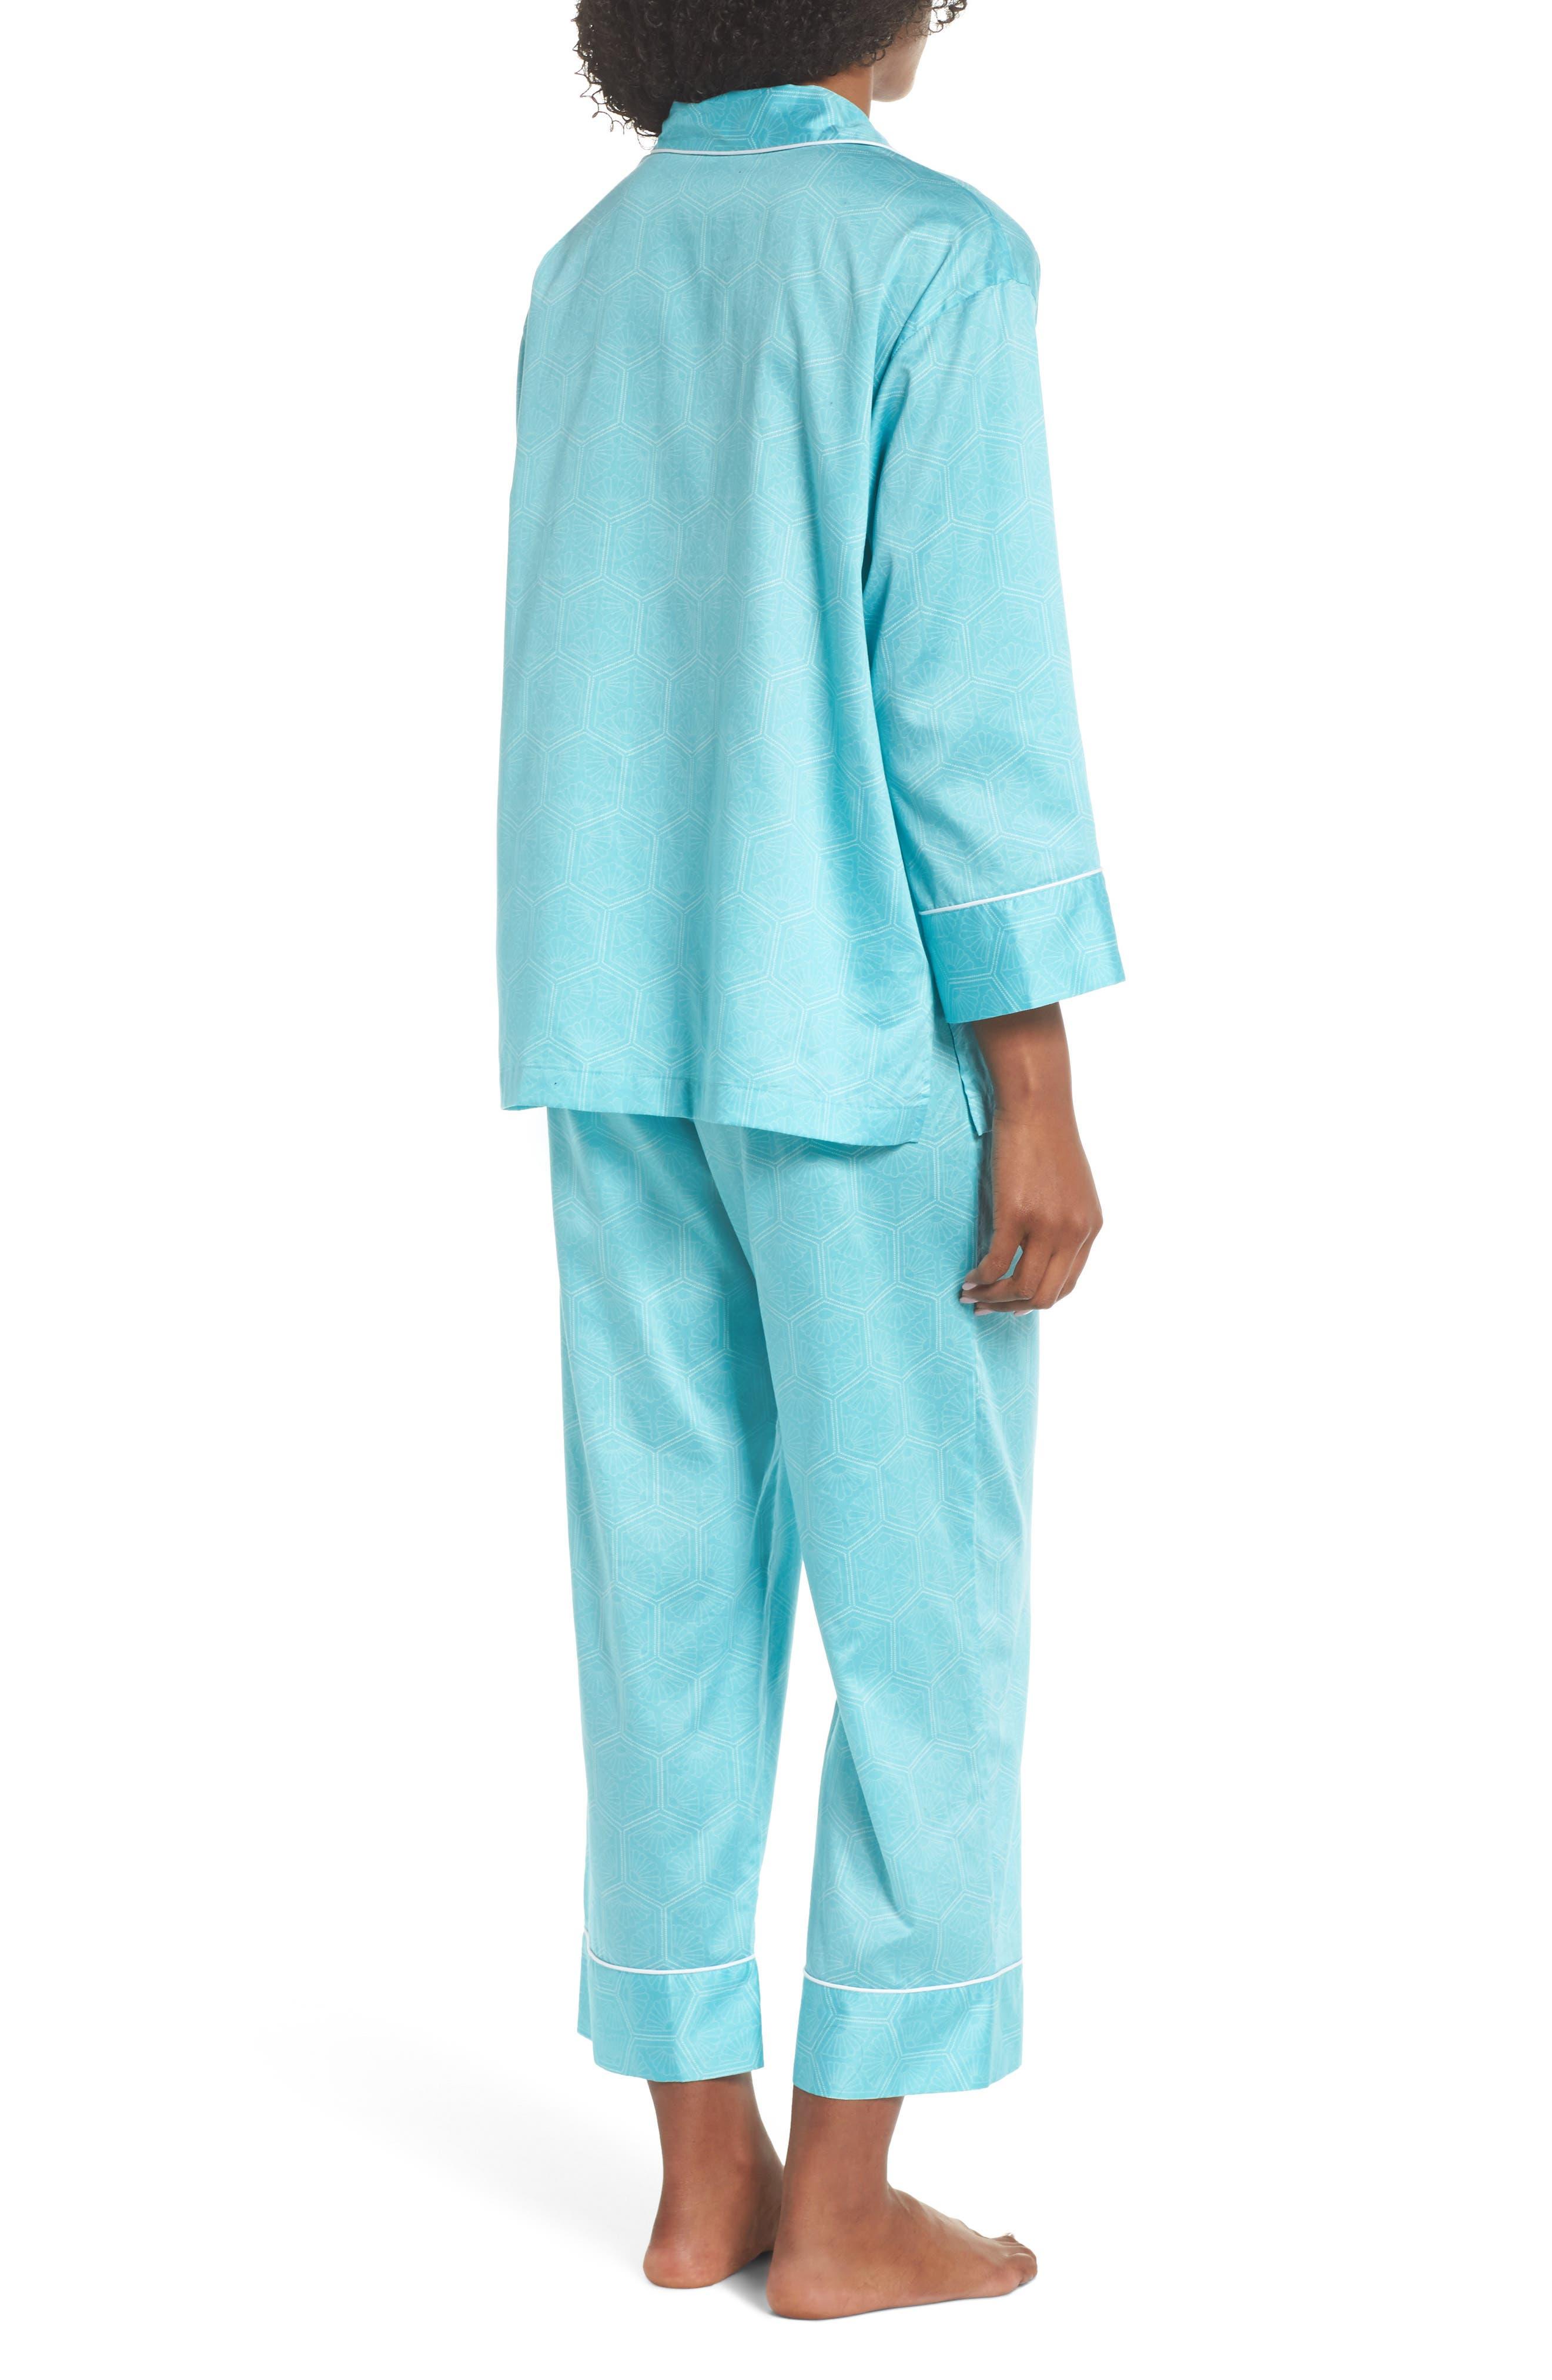 Fan Print Cotton Pajamas,                             Alternate thumbnail 2, color,                             440